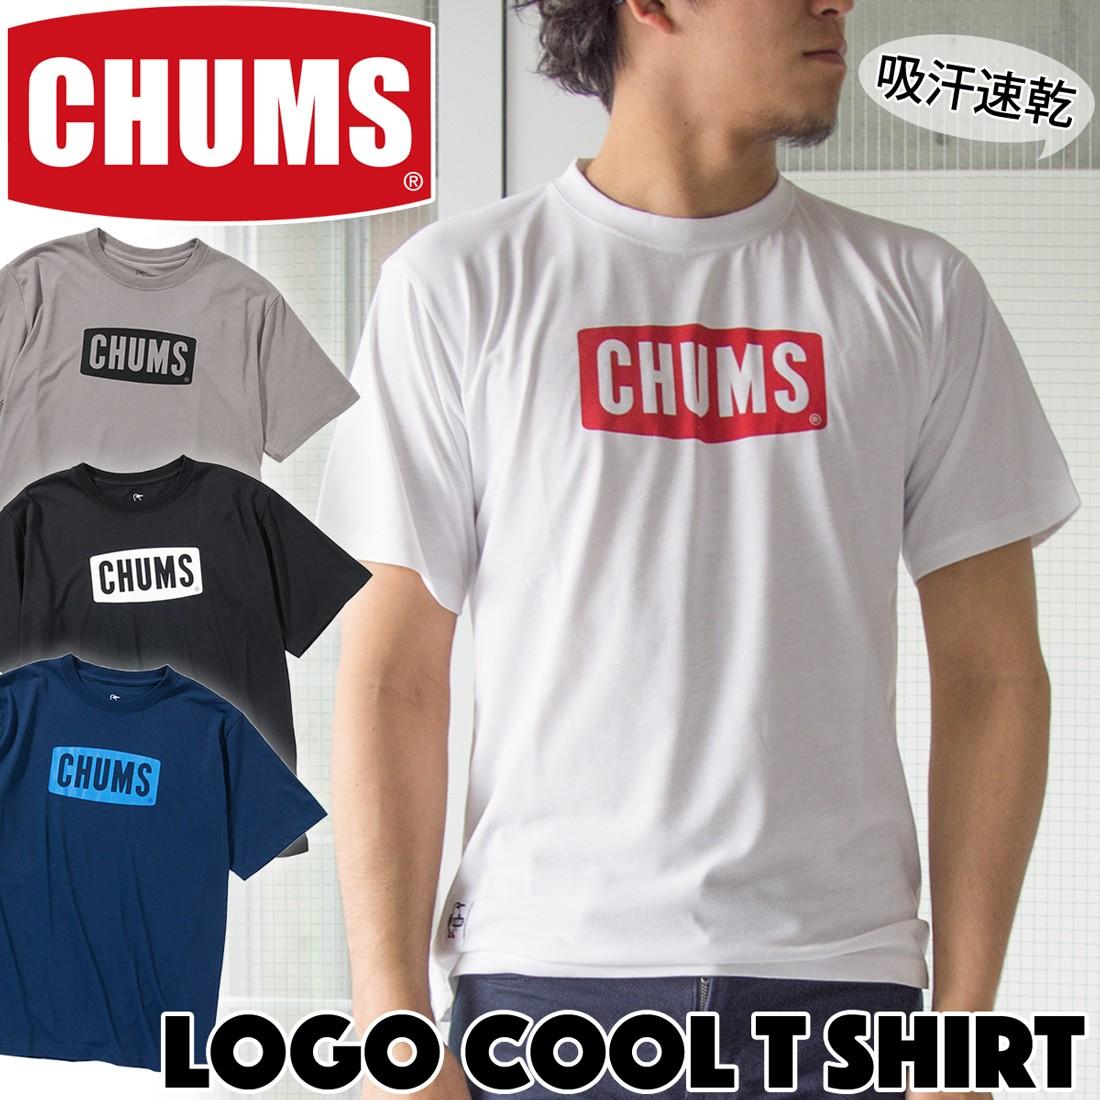 CHUMS Logo Cool T-Shirt